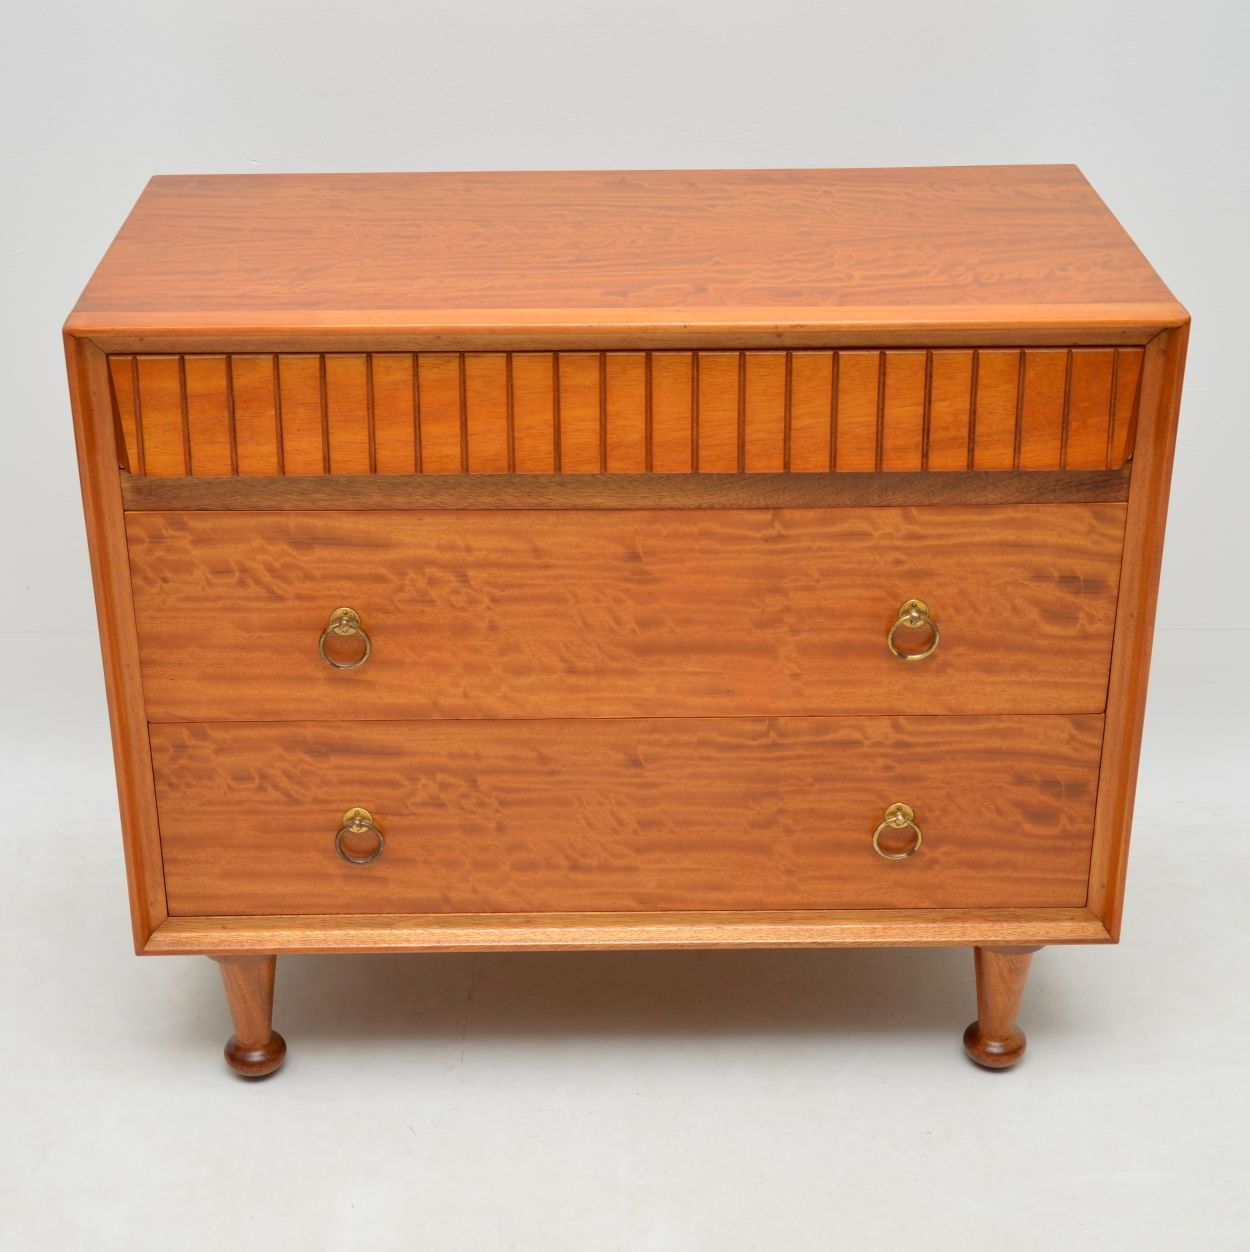 retro_vintage_satinwood_heals_chest_of_drawers_4